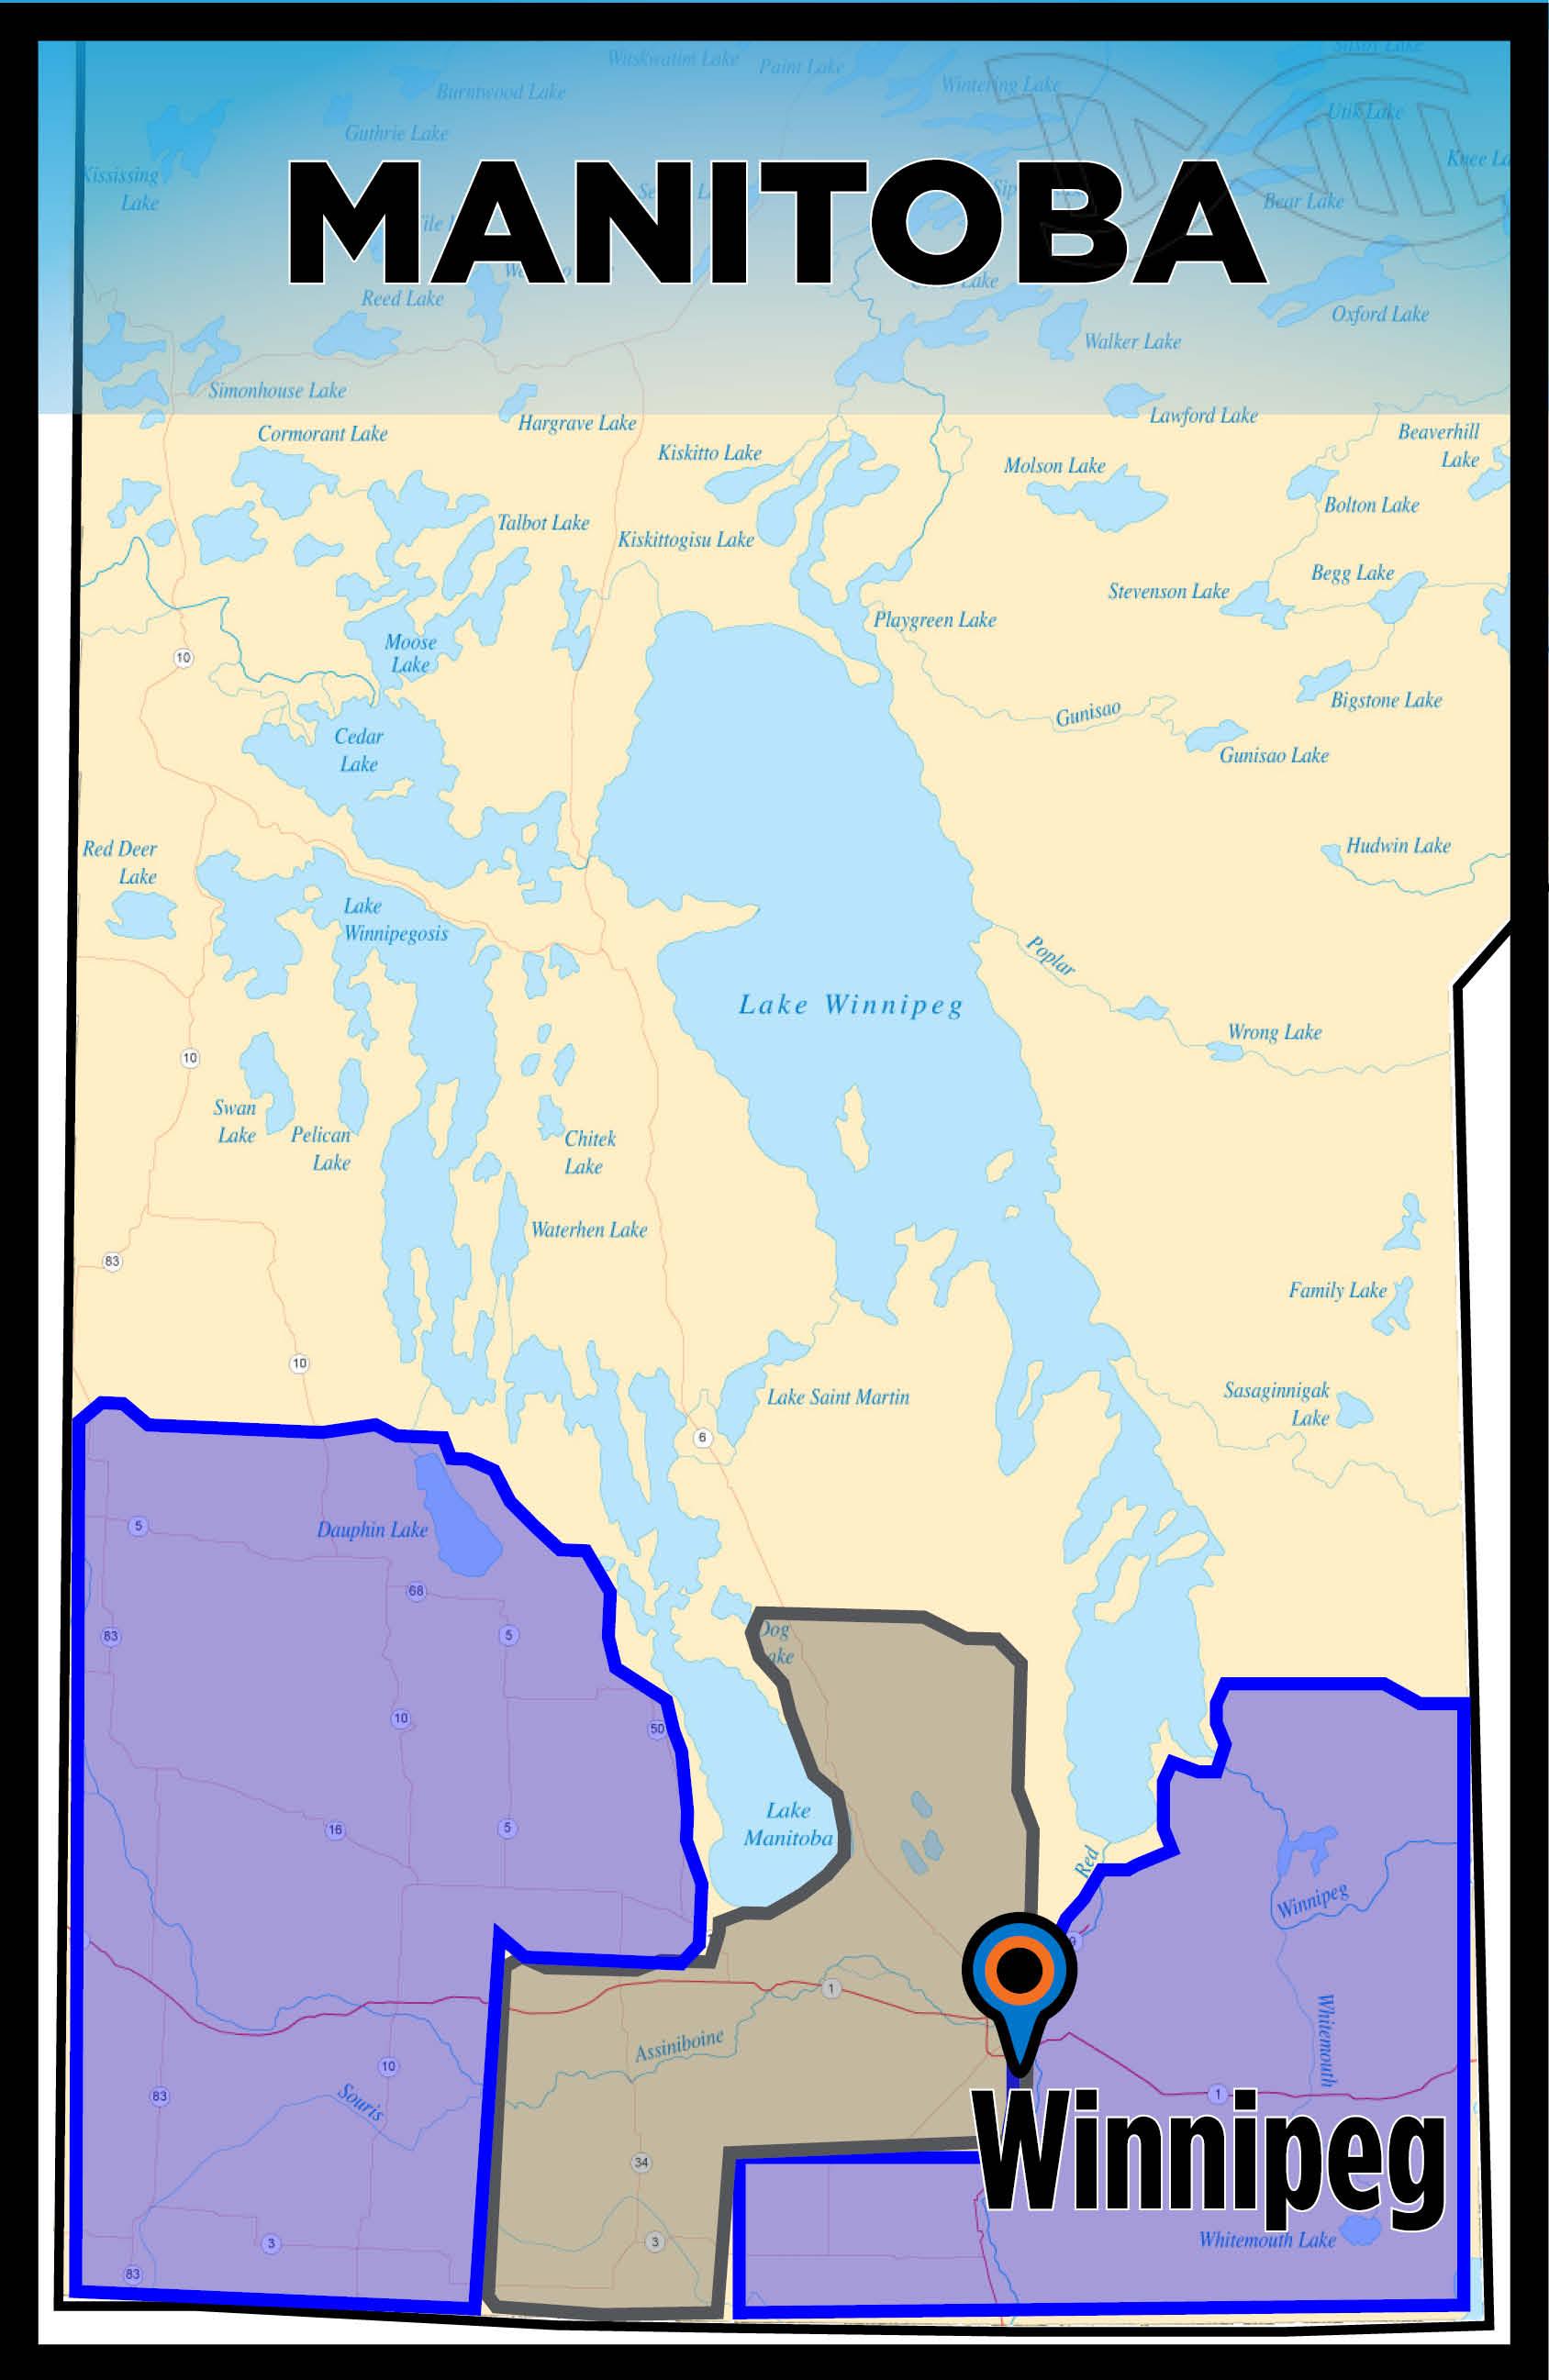 Manitoba Map Sales rep